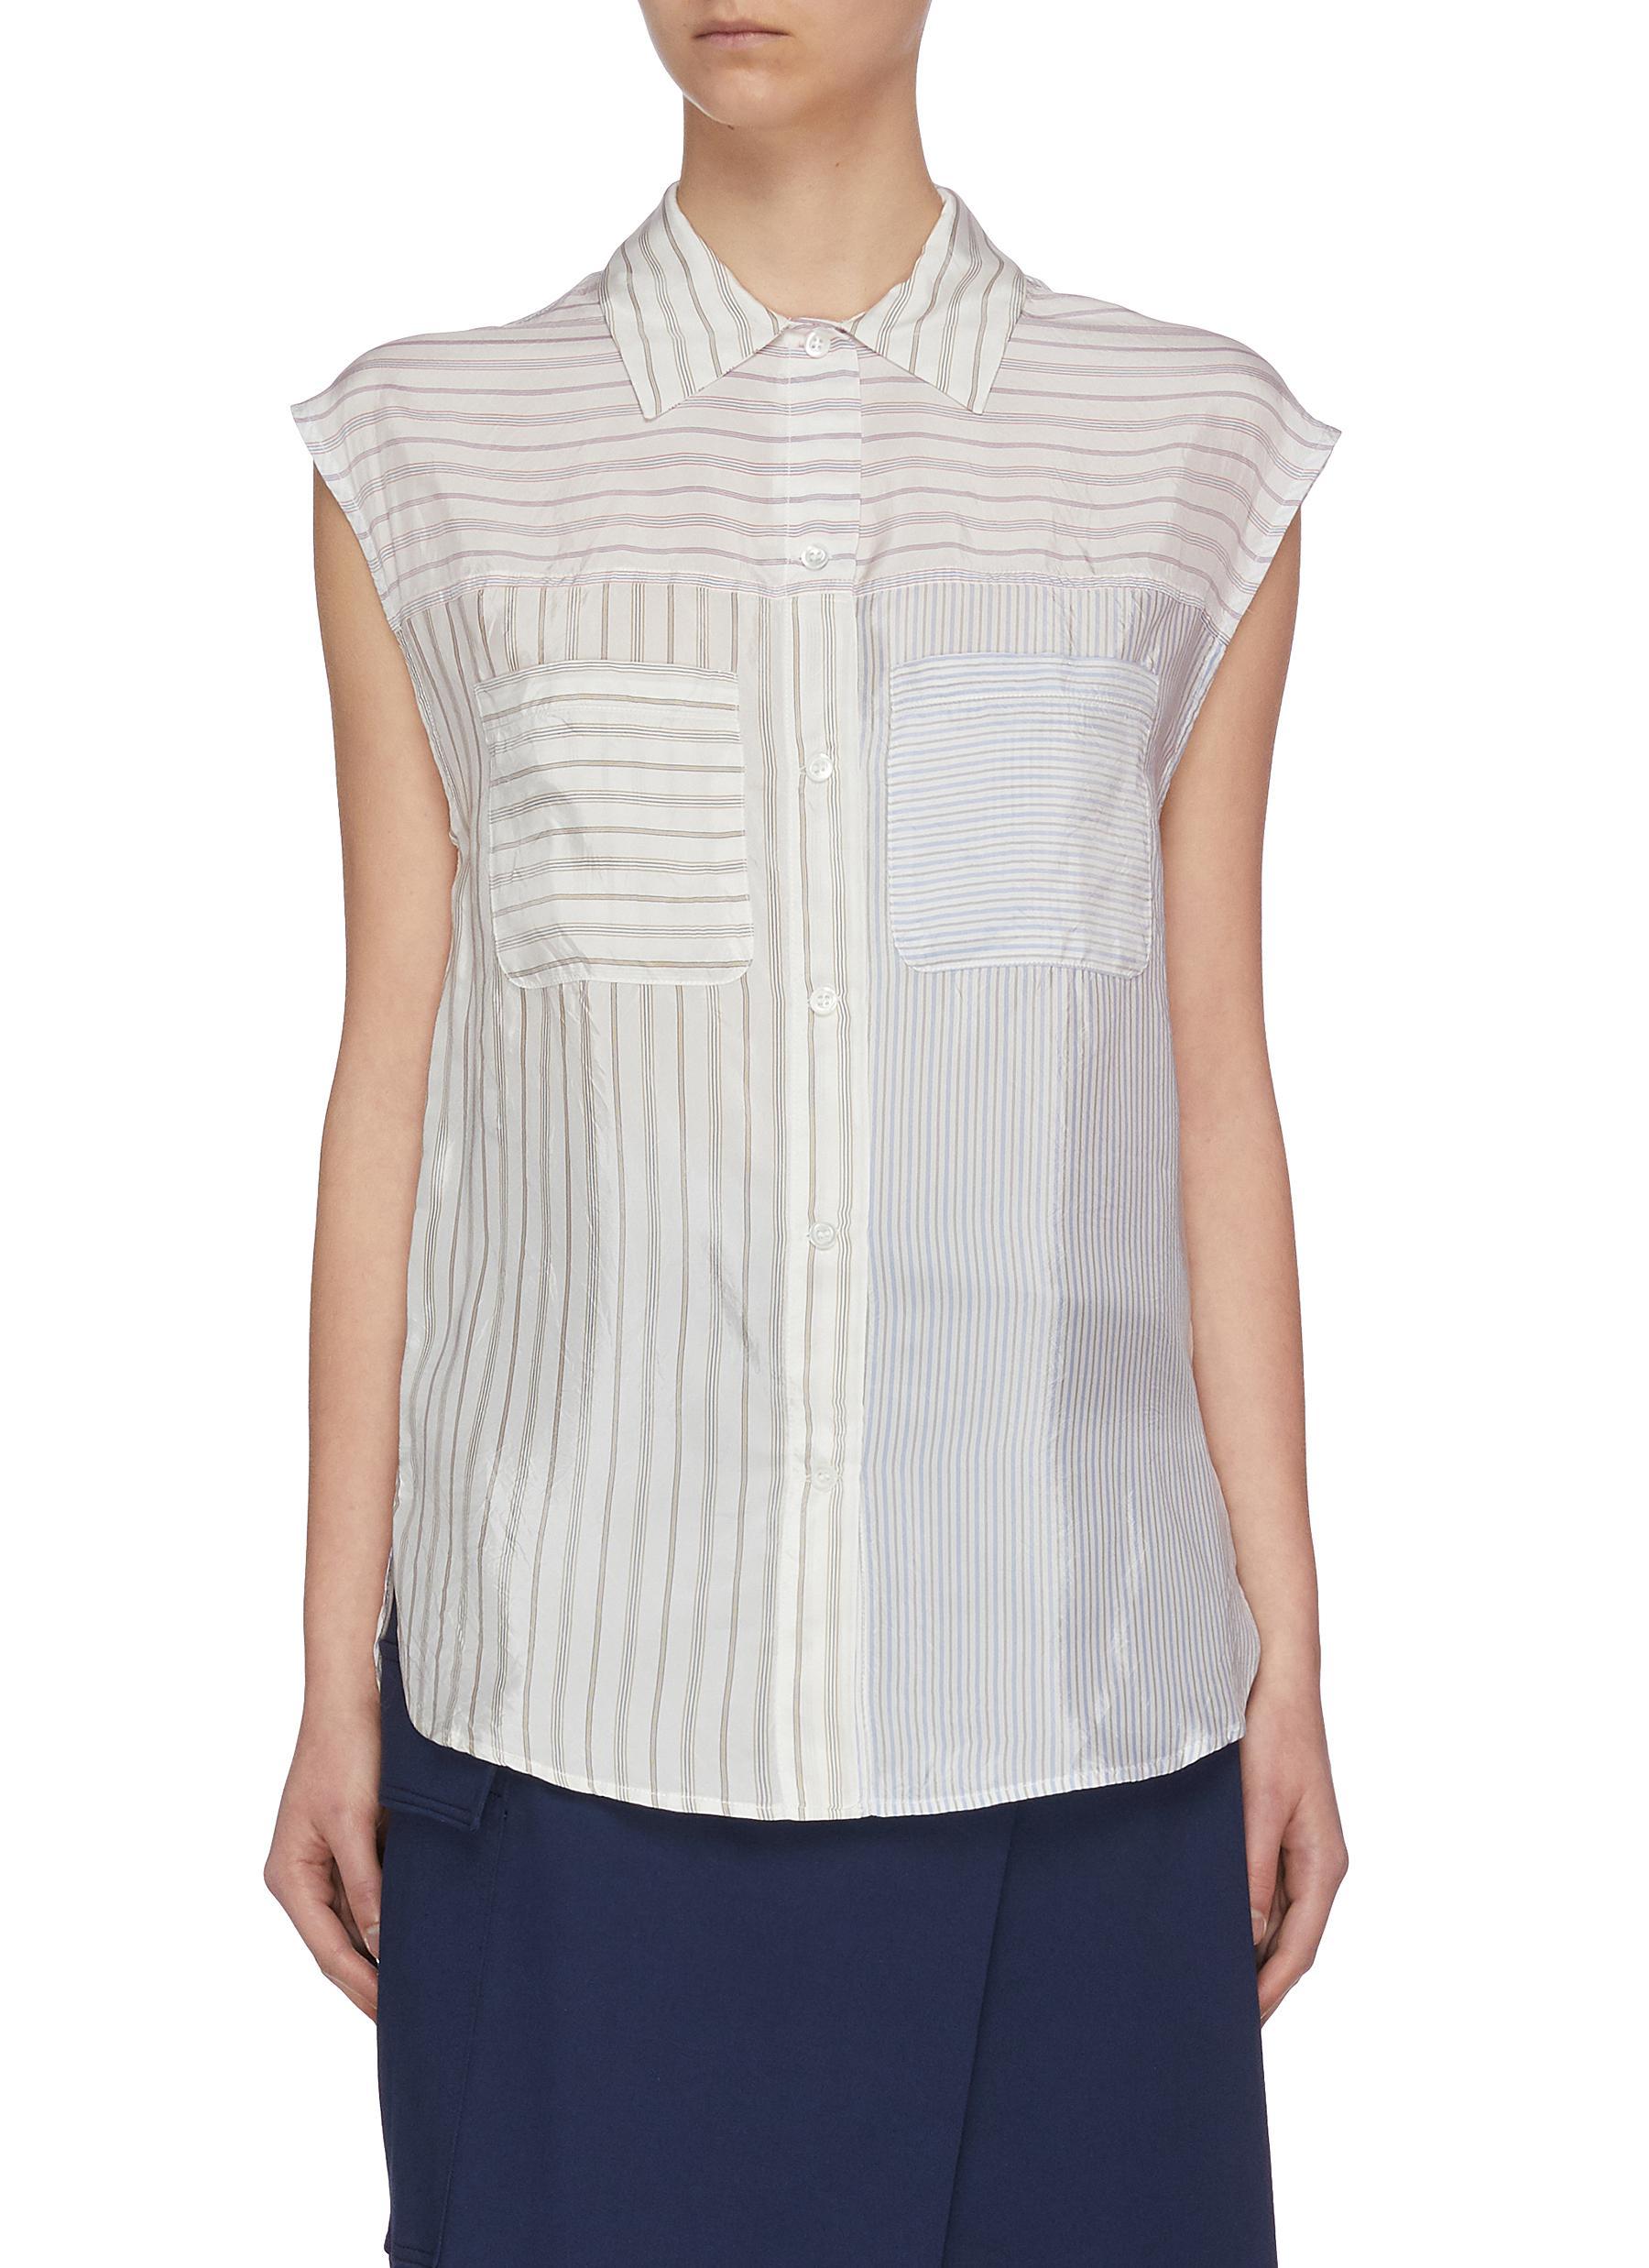 Buy Barena Tops 'Euclide' Collaged Pinstripe Shirt